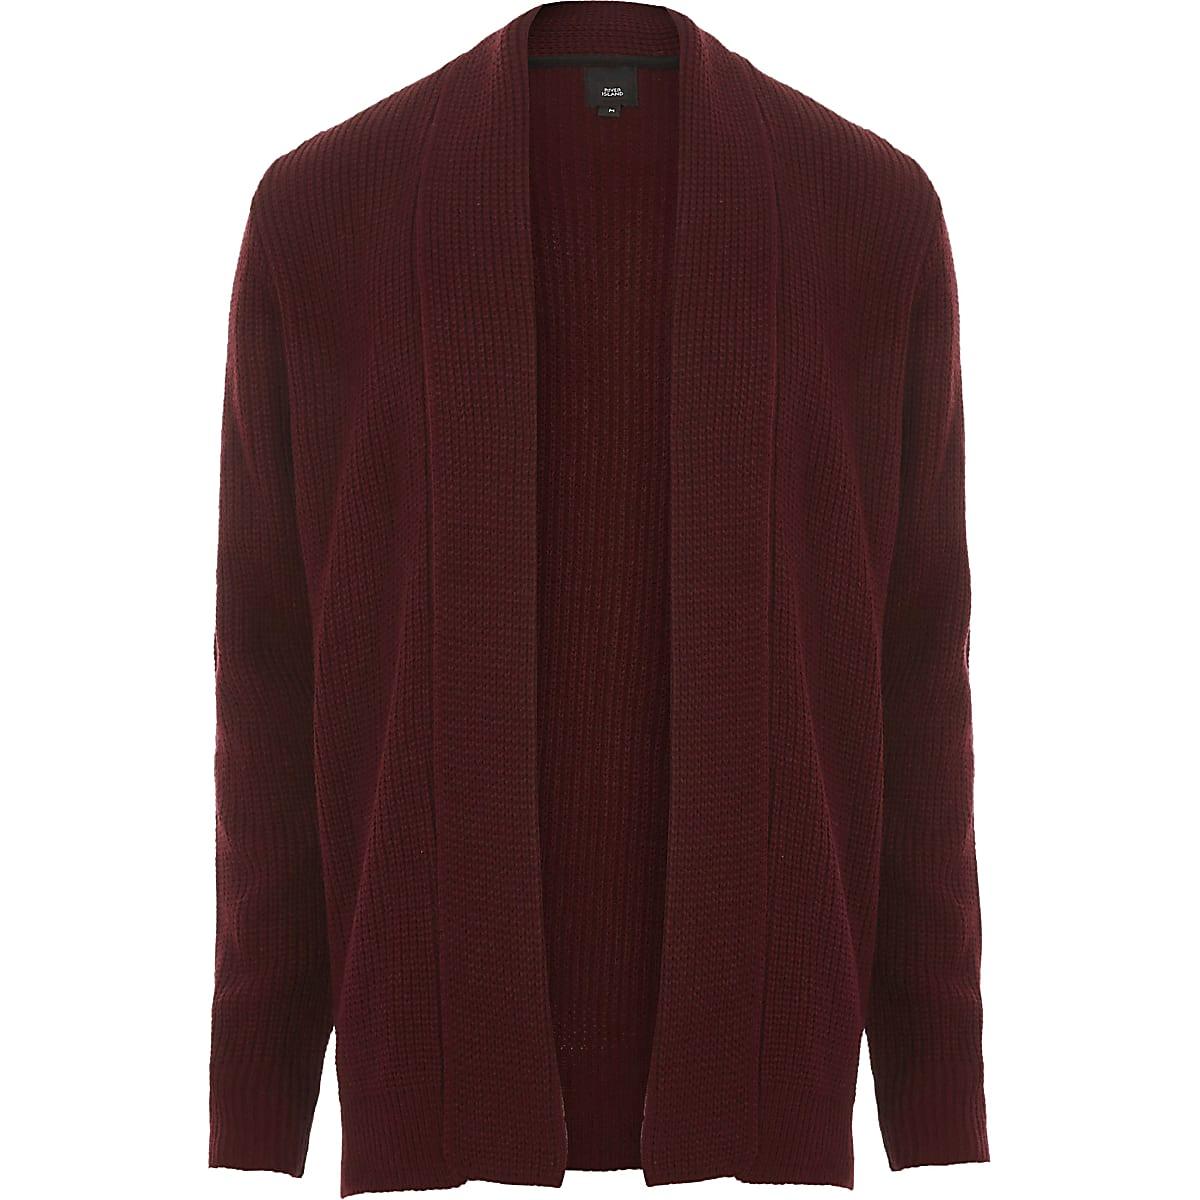 Dark red open front rib knit cardigan